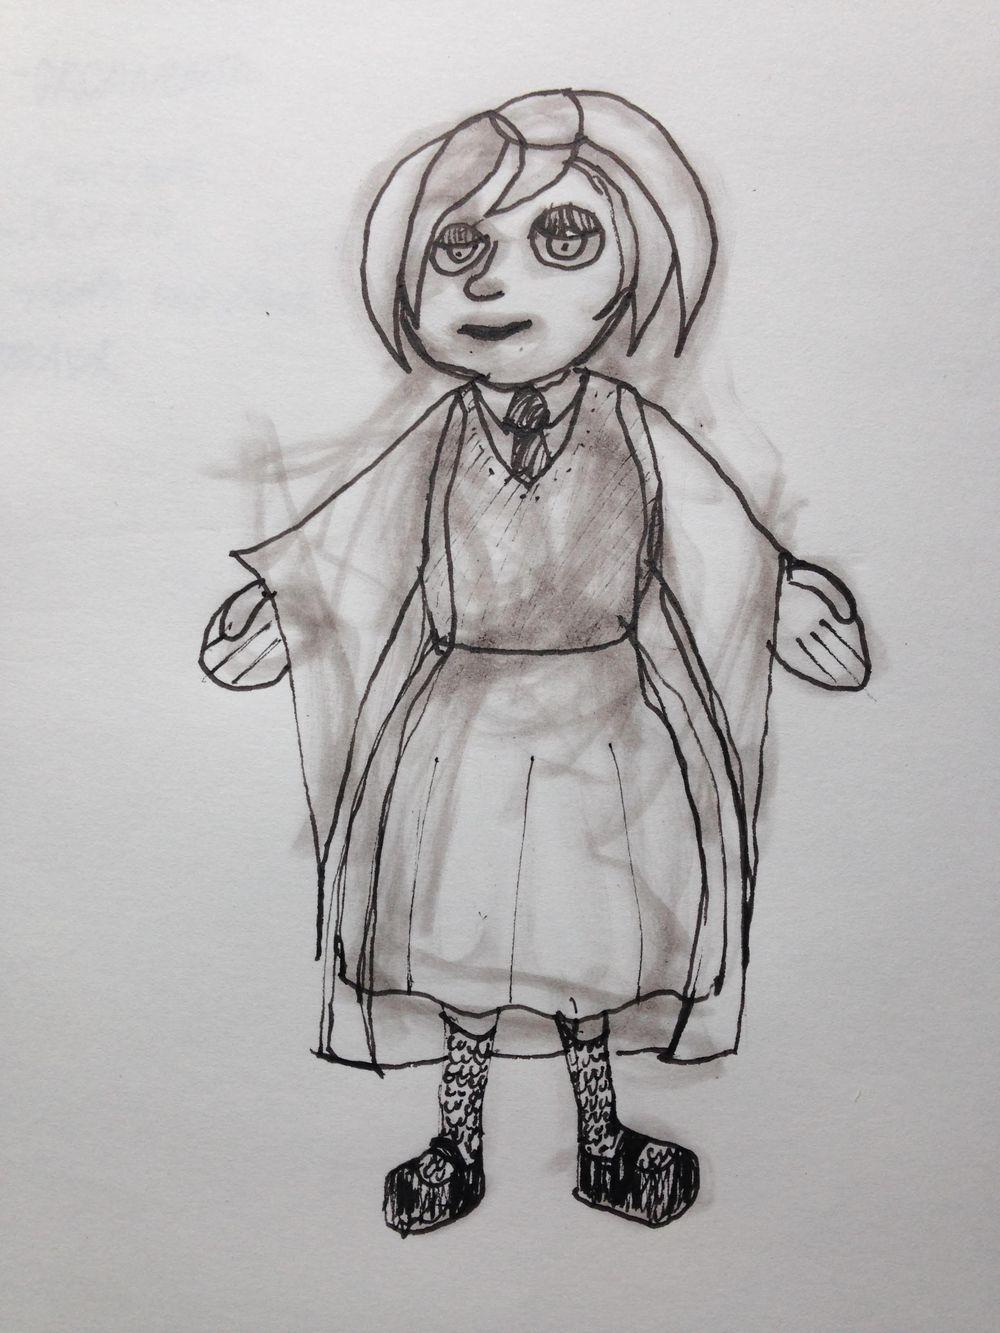 Matilda Blueberry - image 6 - student project